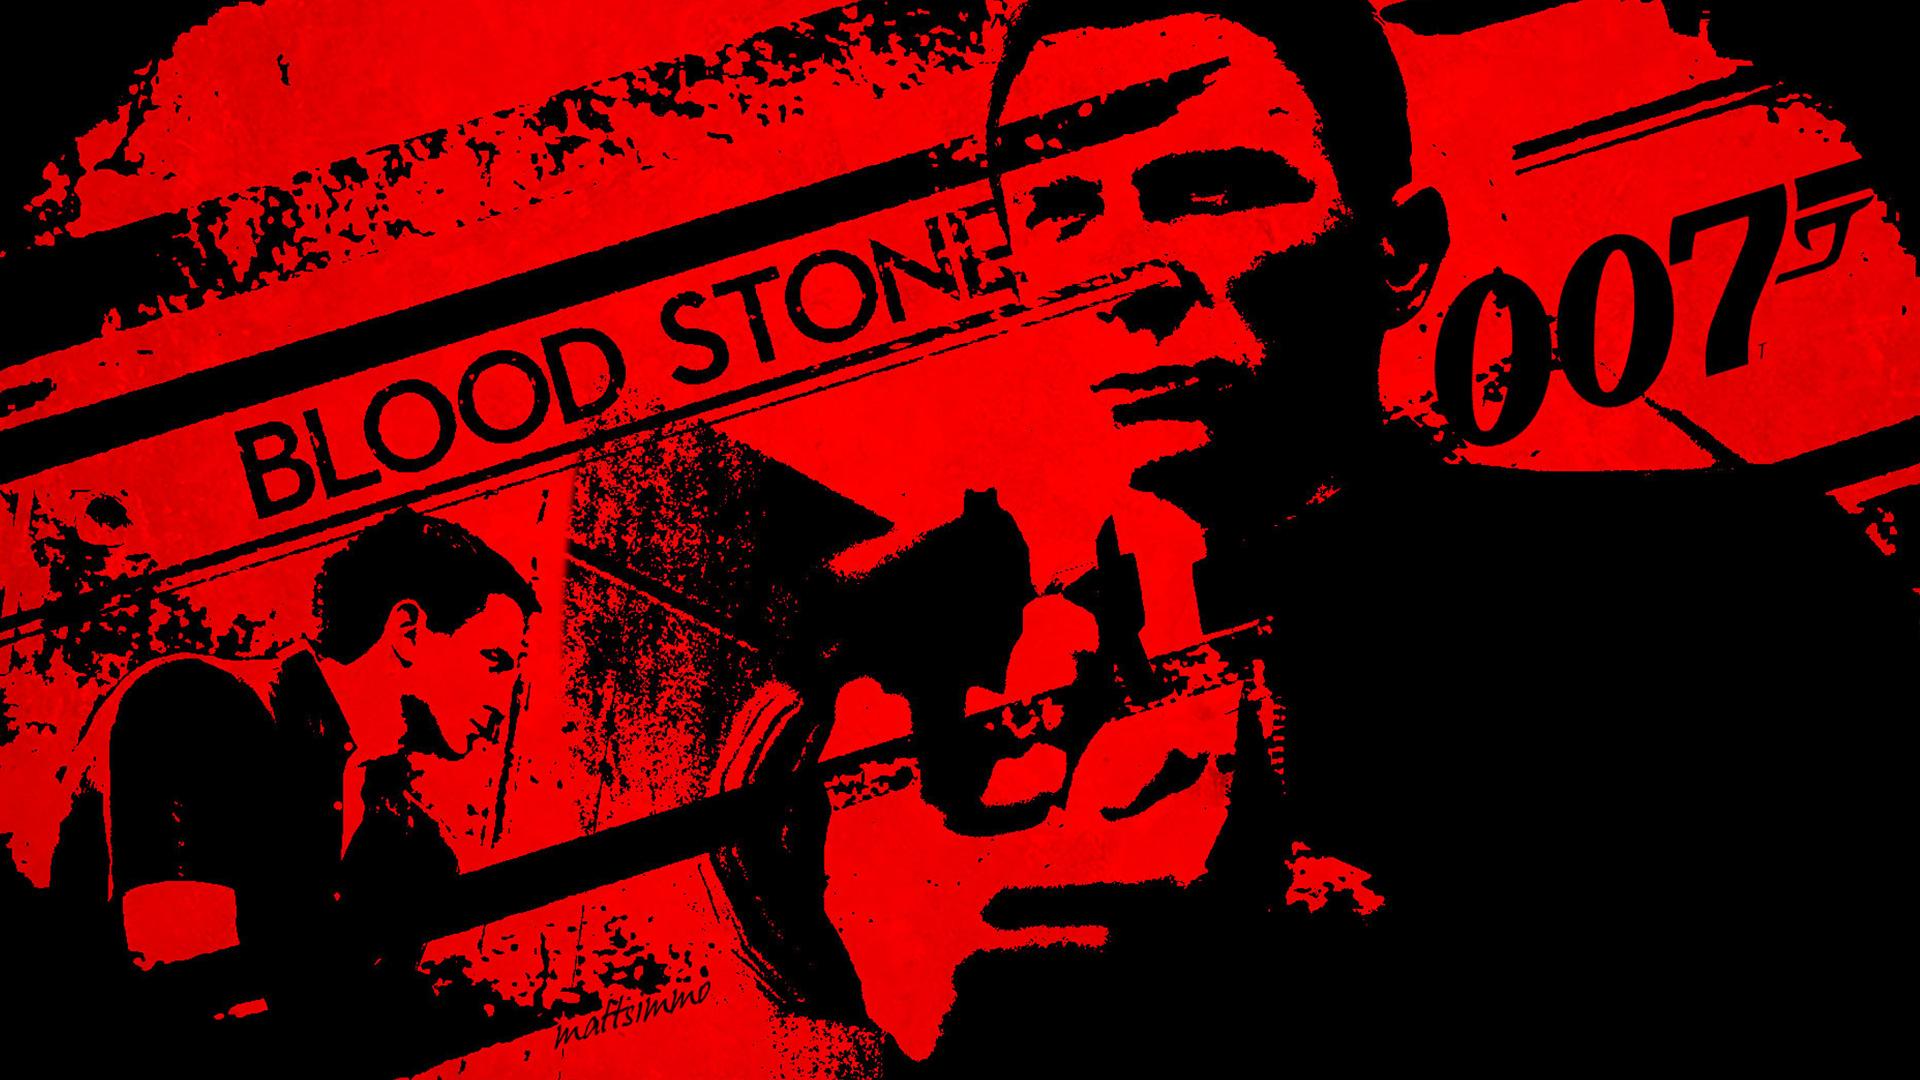 007: Blood Stone Wallpaper in 1920x1080